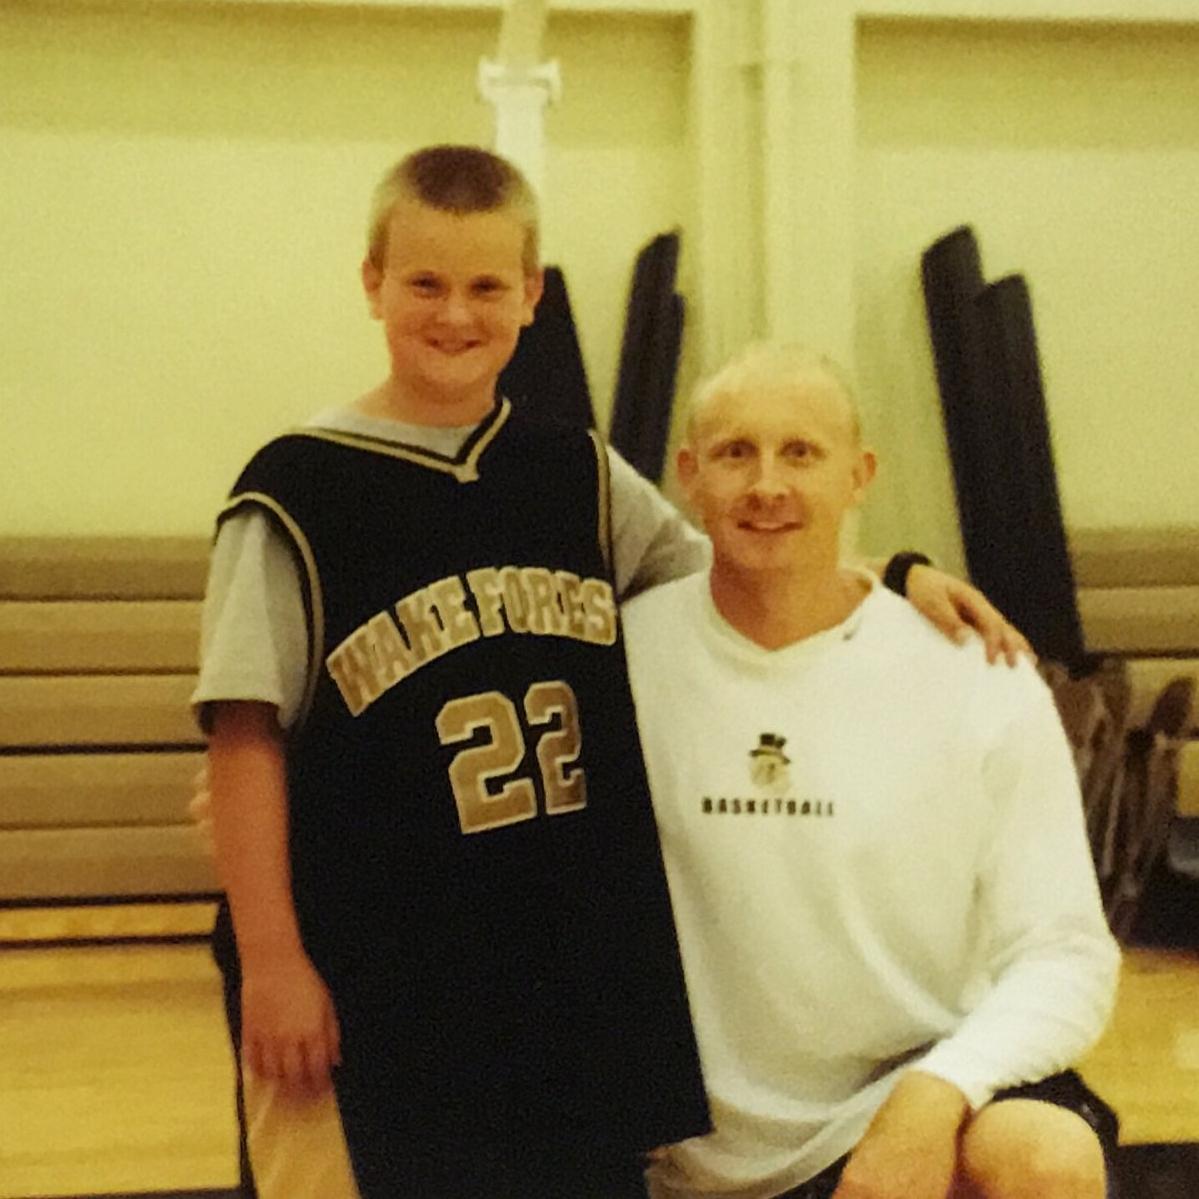 Coach Mack and me